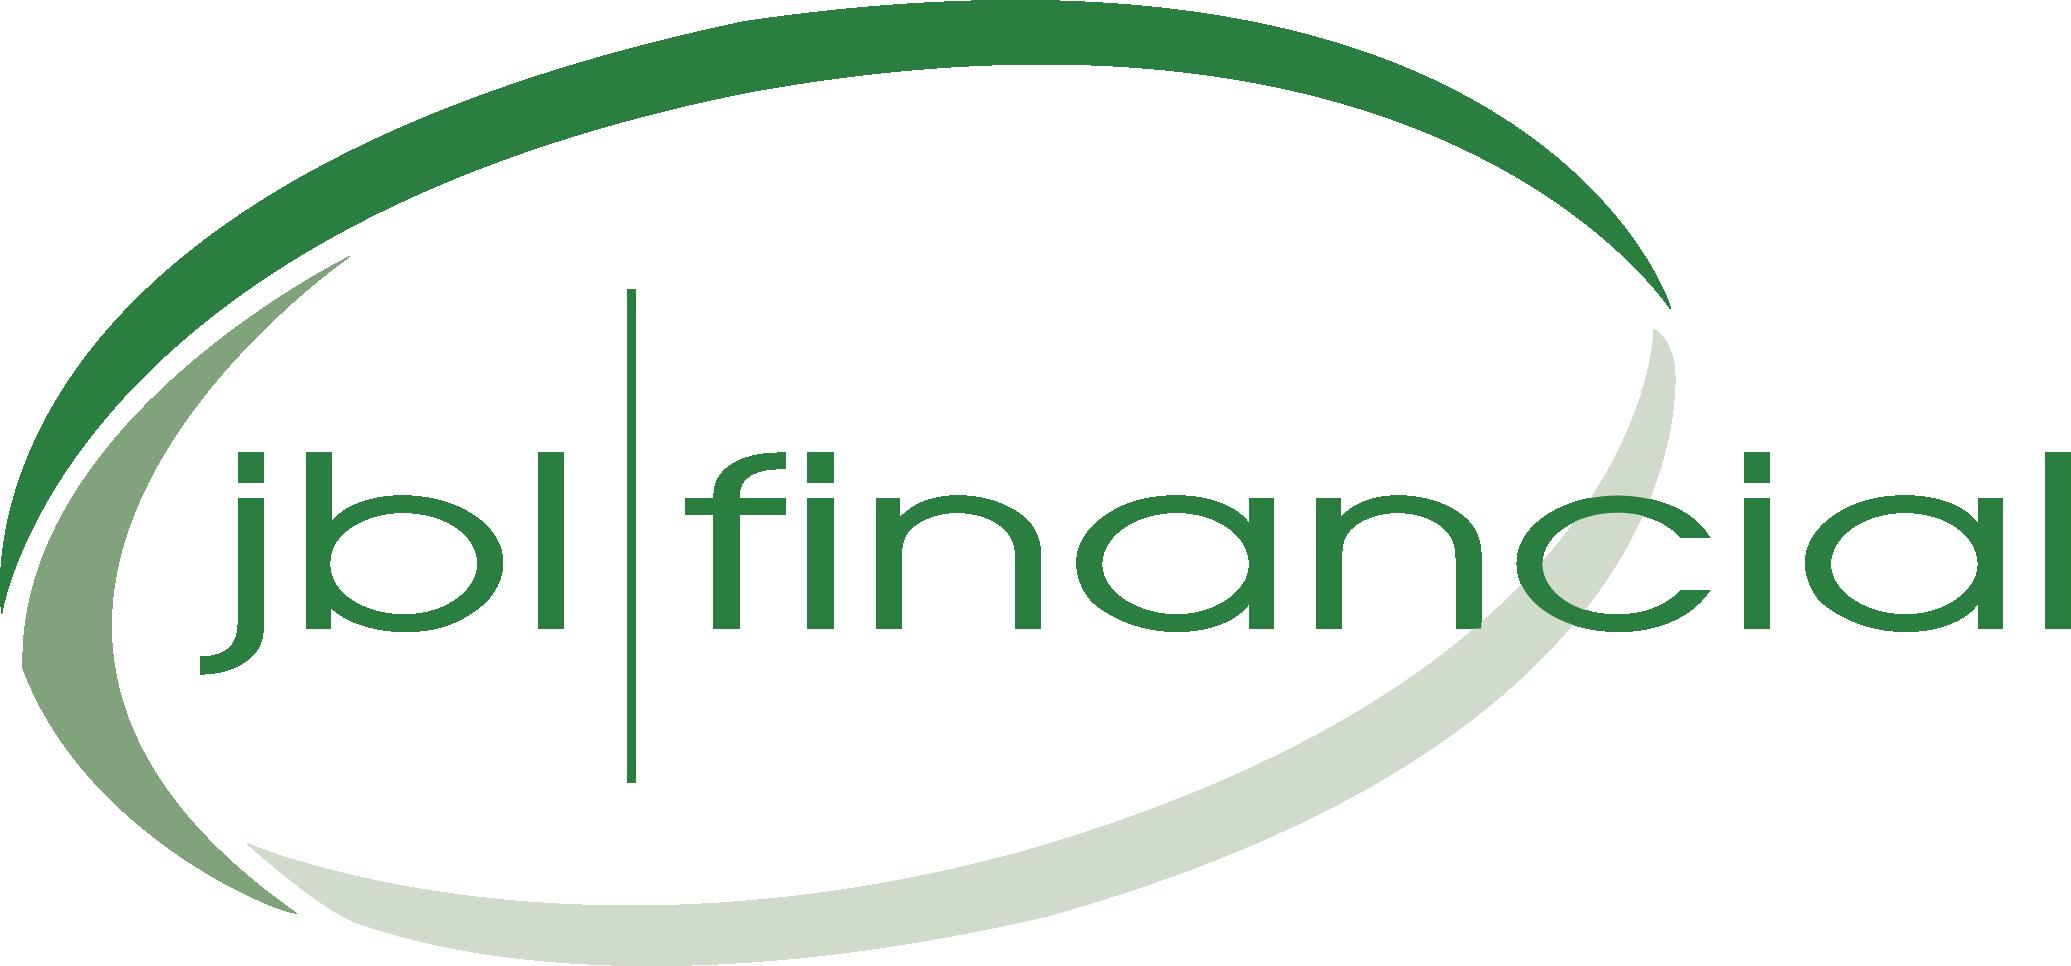 The Retirement Coaches | JBL Financial Services, Inc.